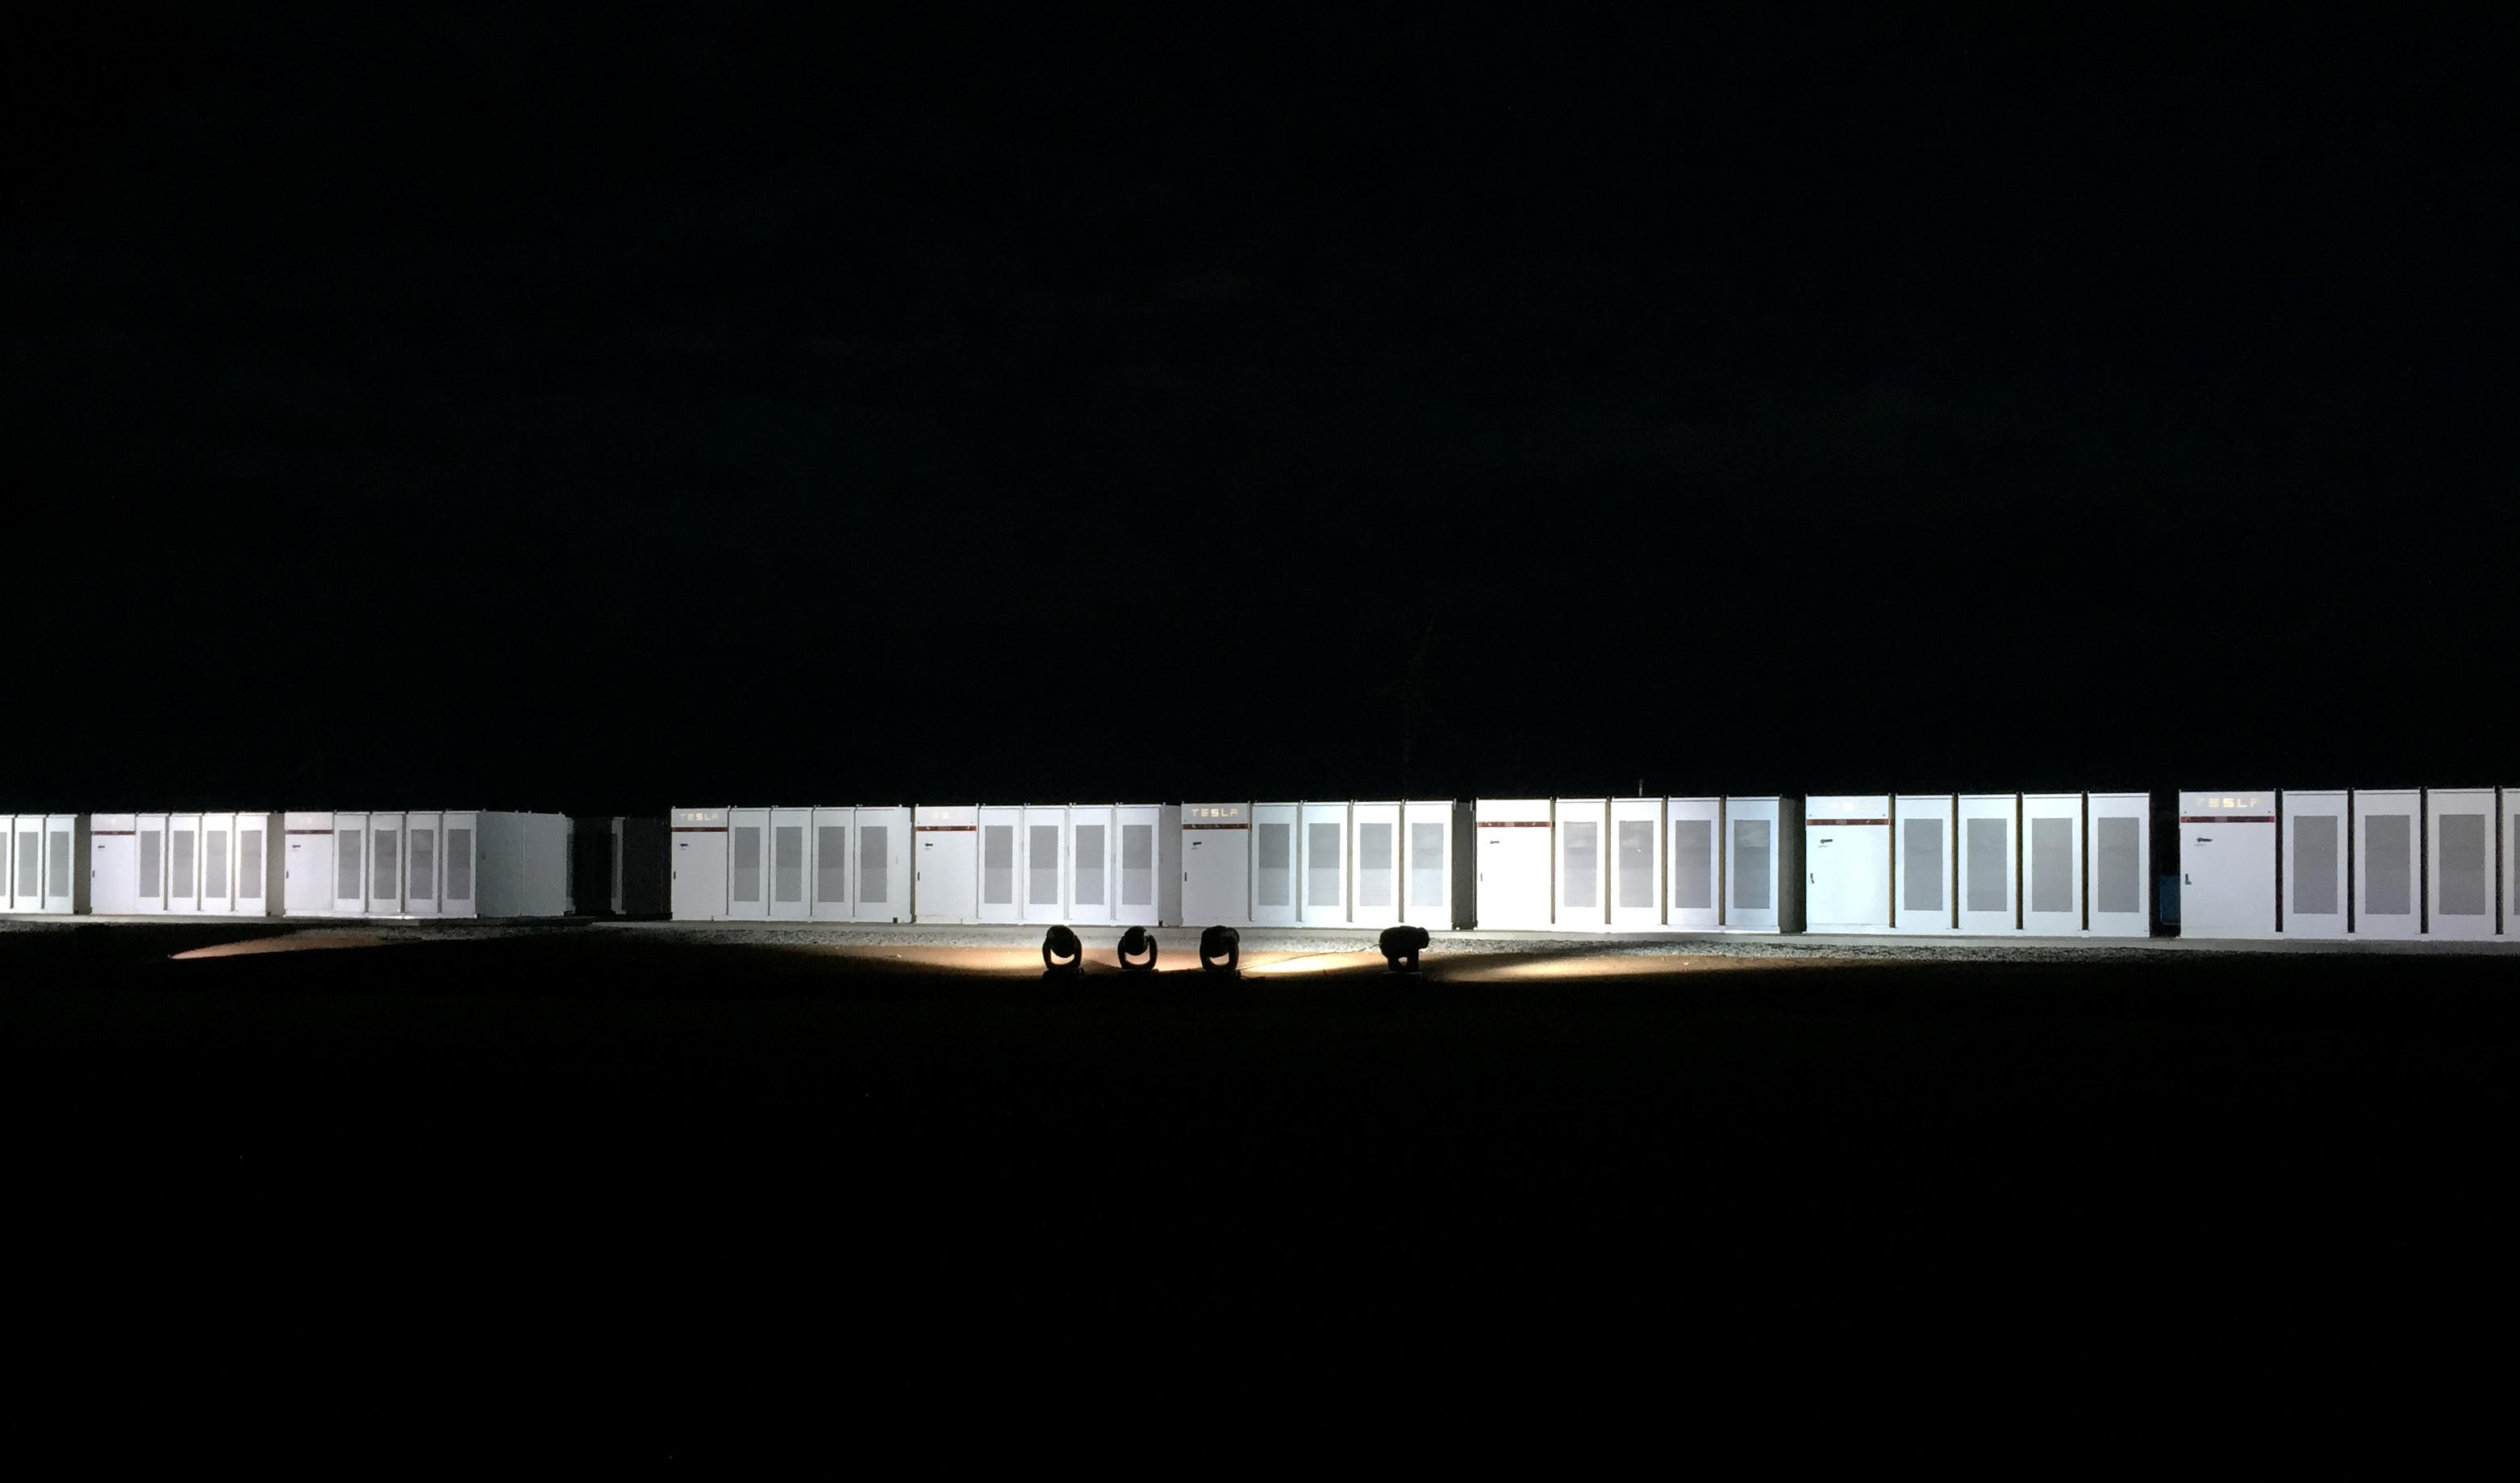 Elon Musk S Giant Tesla Battery In Australia Proves It Can Power The Grid When Coal Plants Fail Quartz